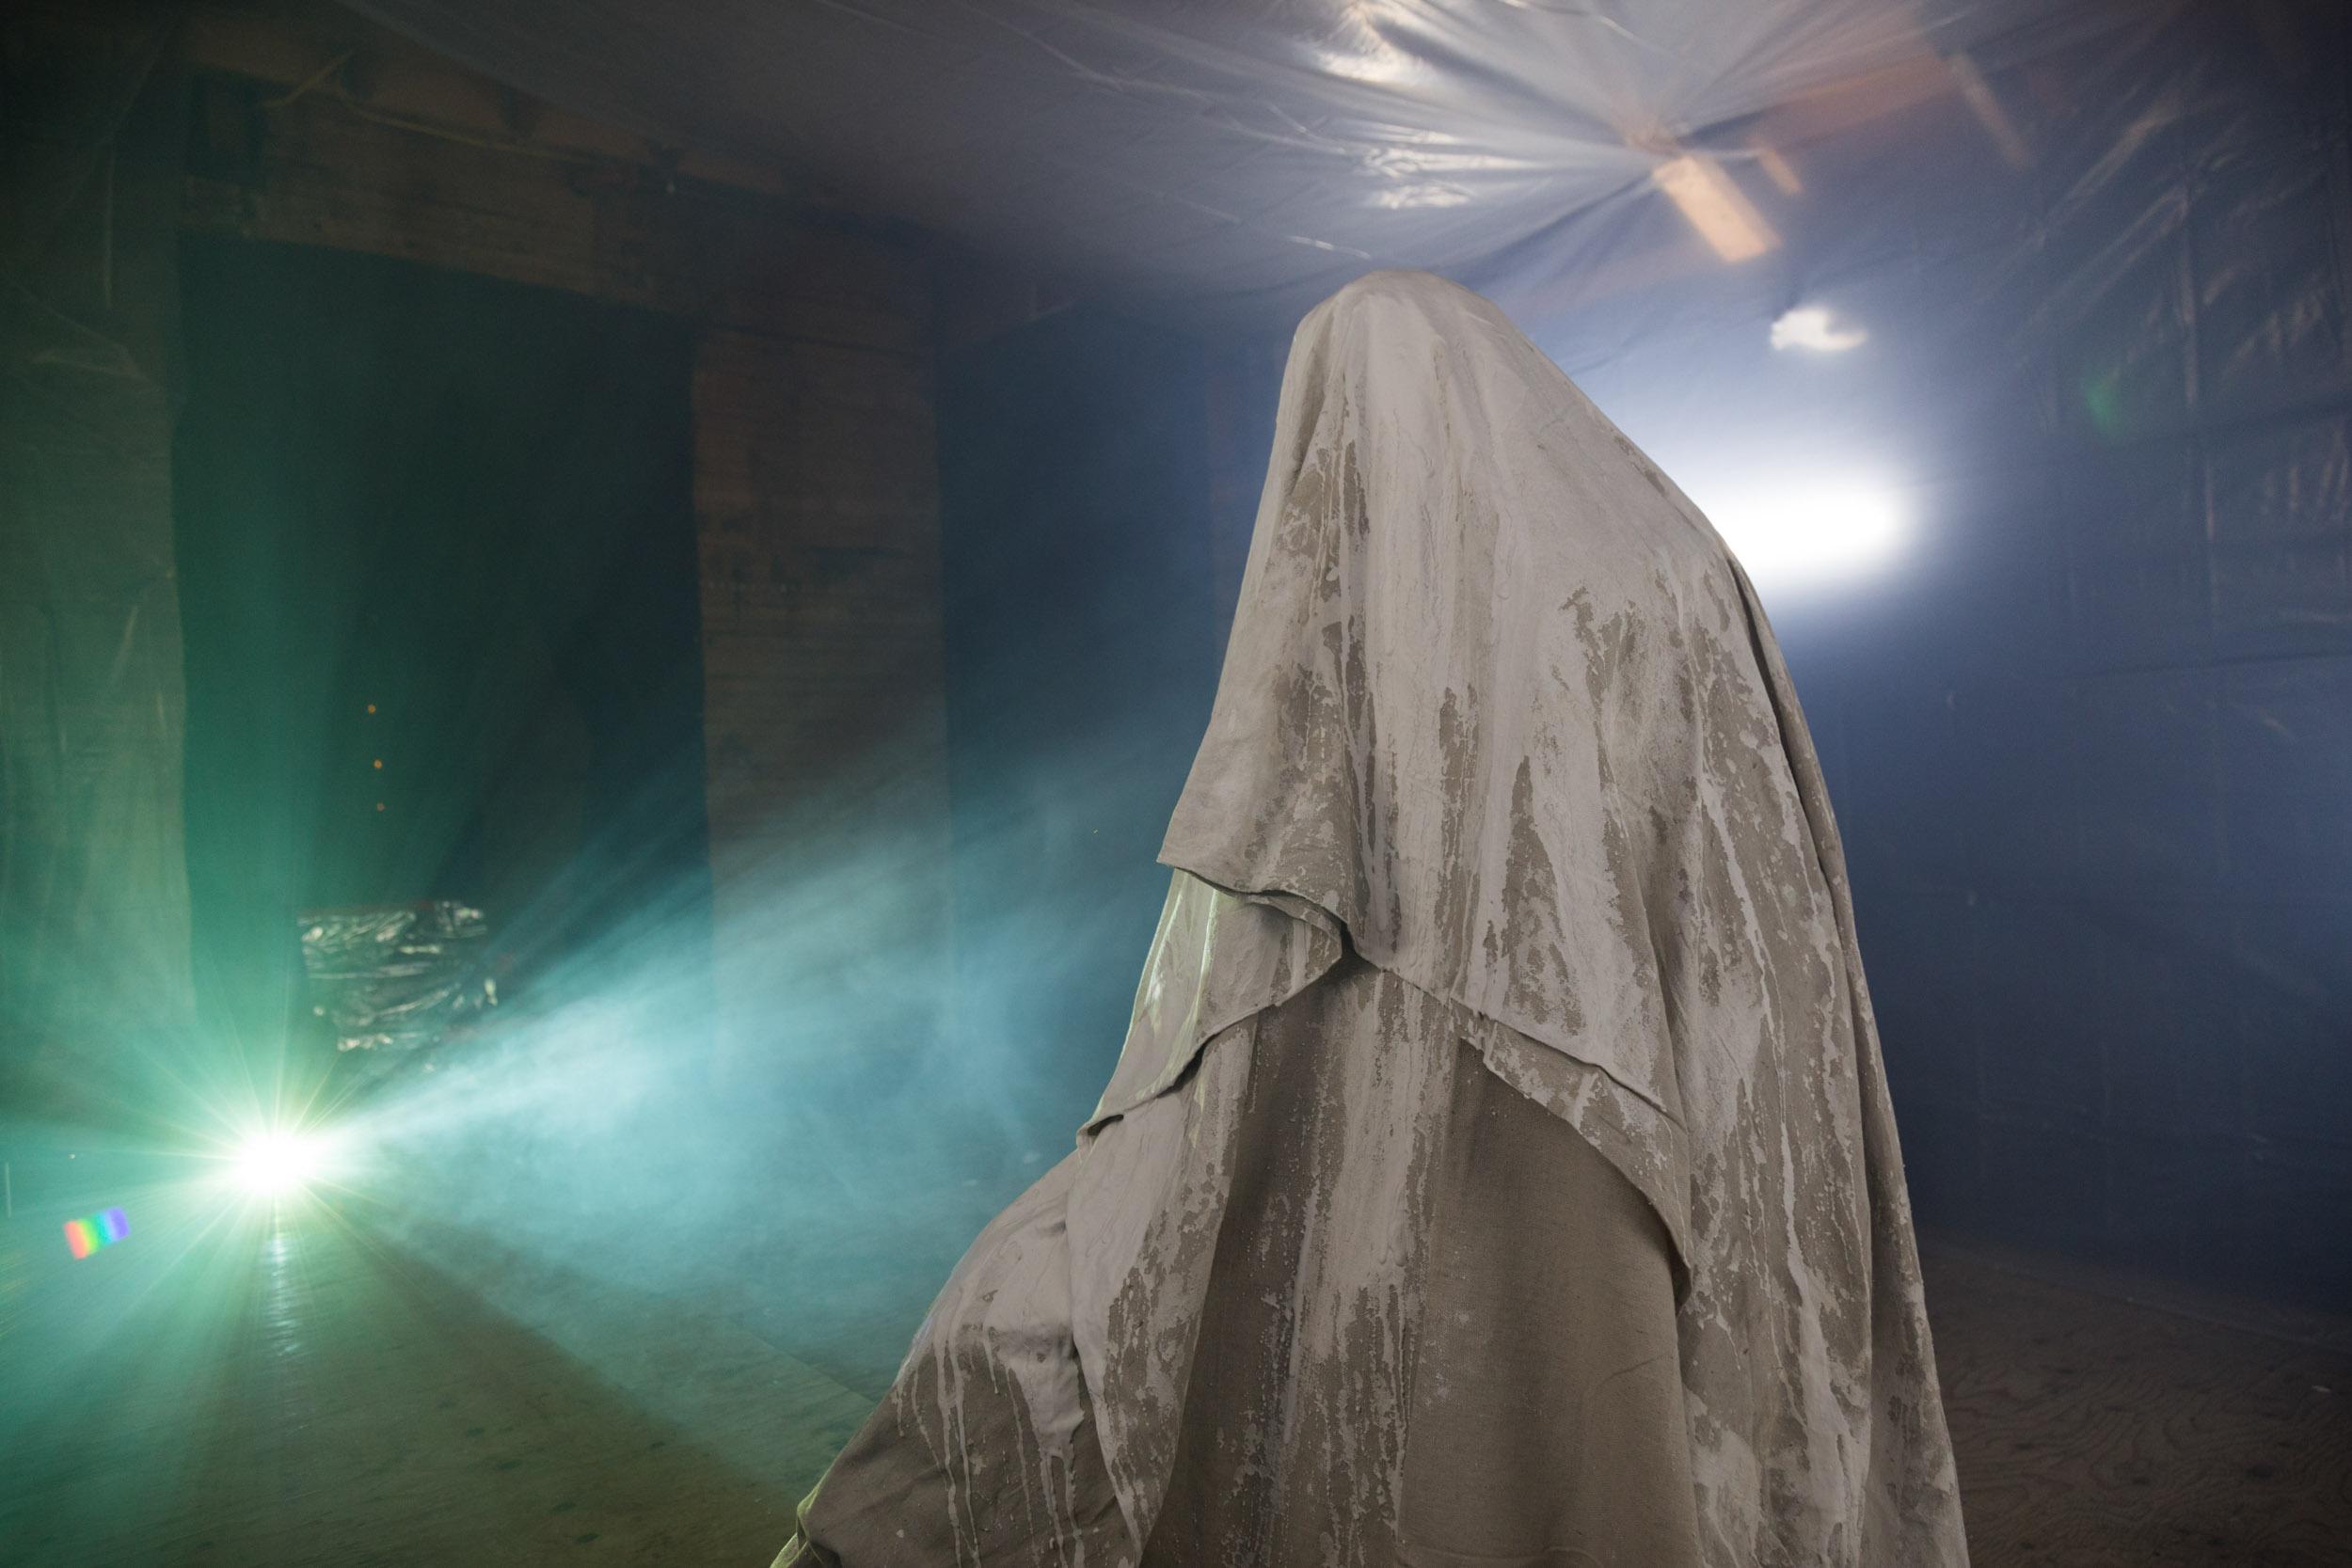 wassaic-project-haunted-mill-2017-10-28-18-19-01.jpg